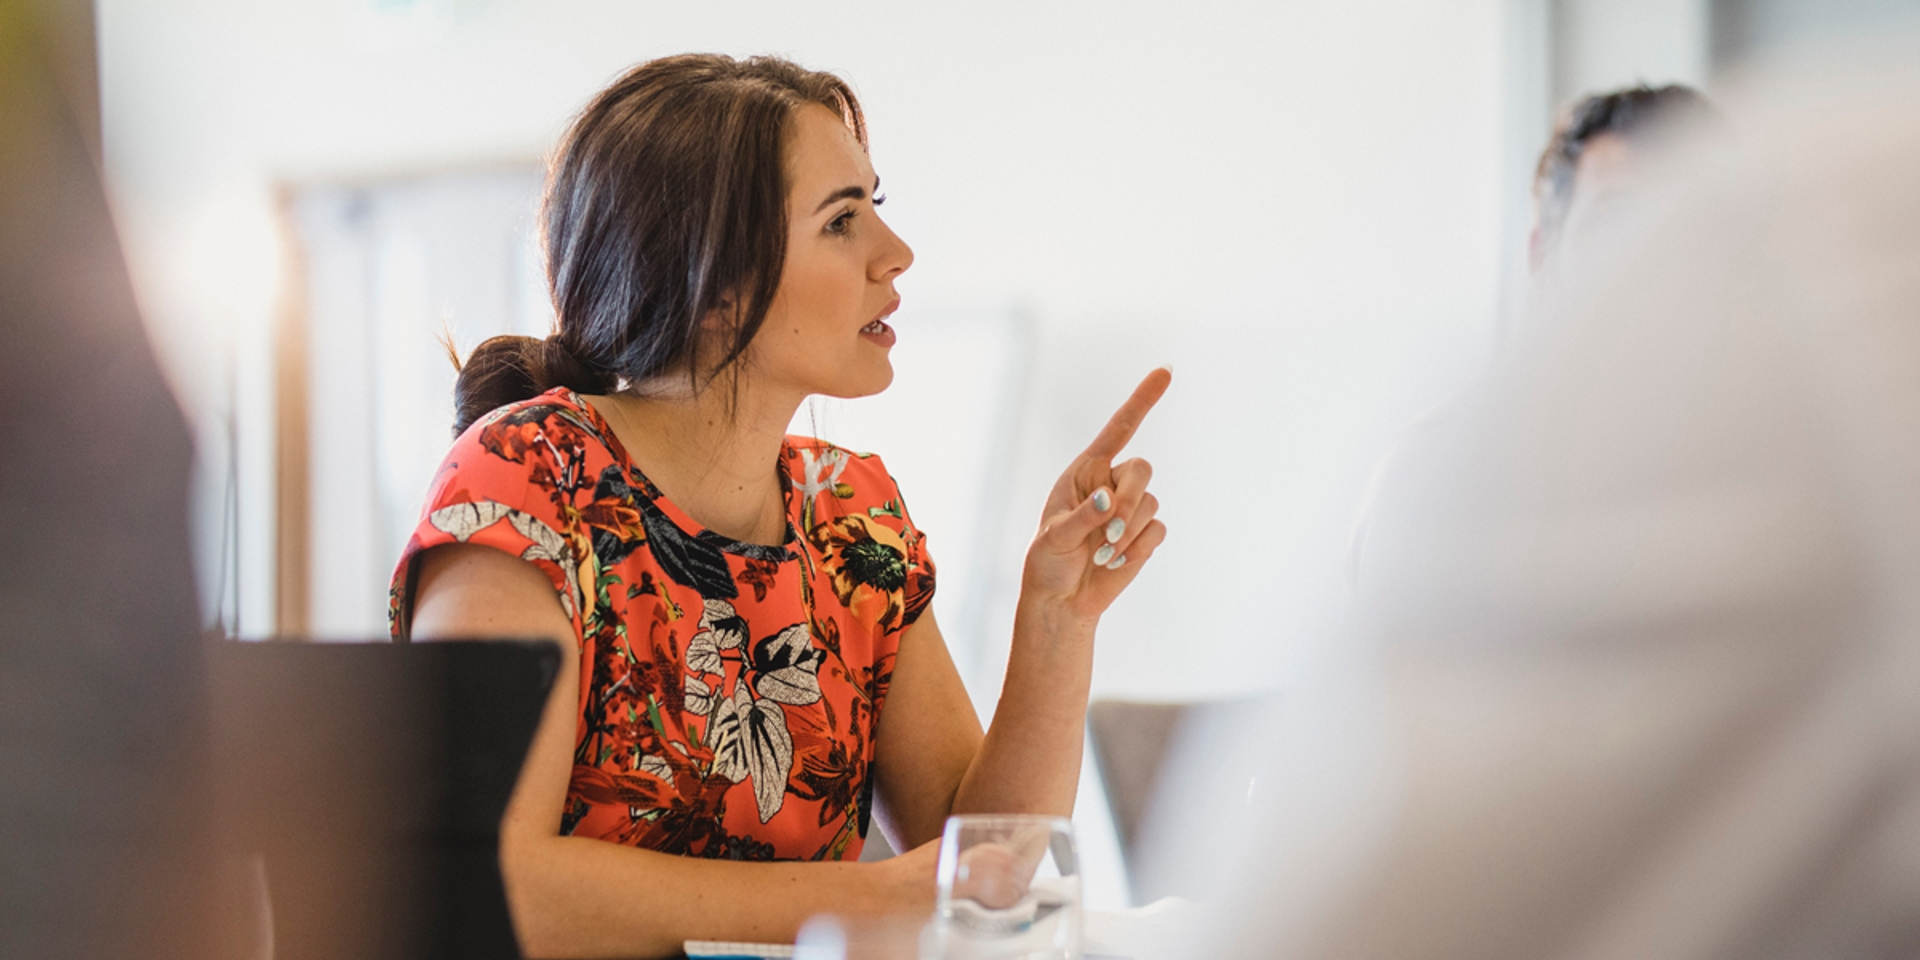 Domaine expertise compliance juridique - agence recrutement placement